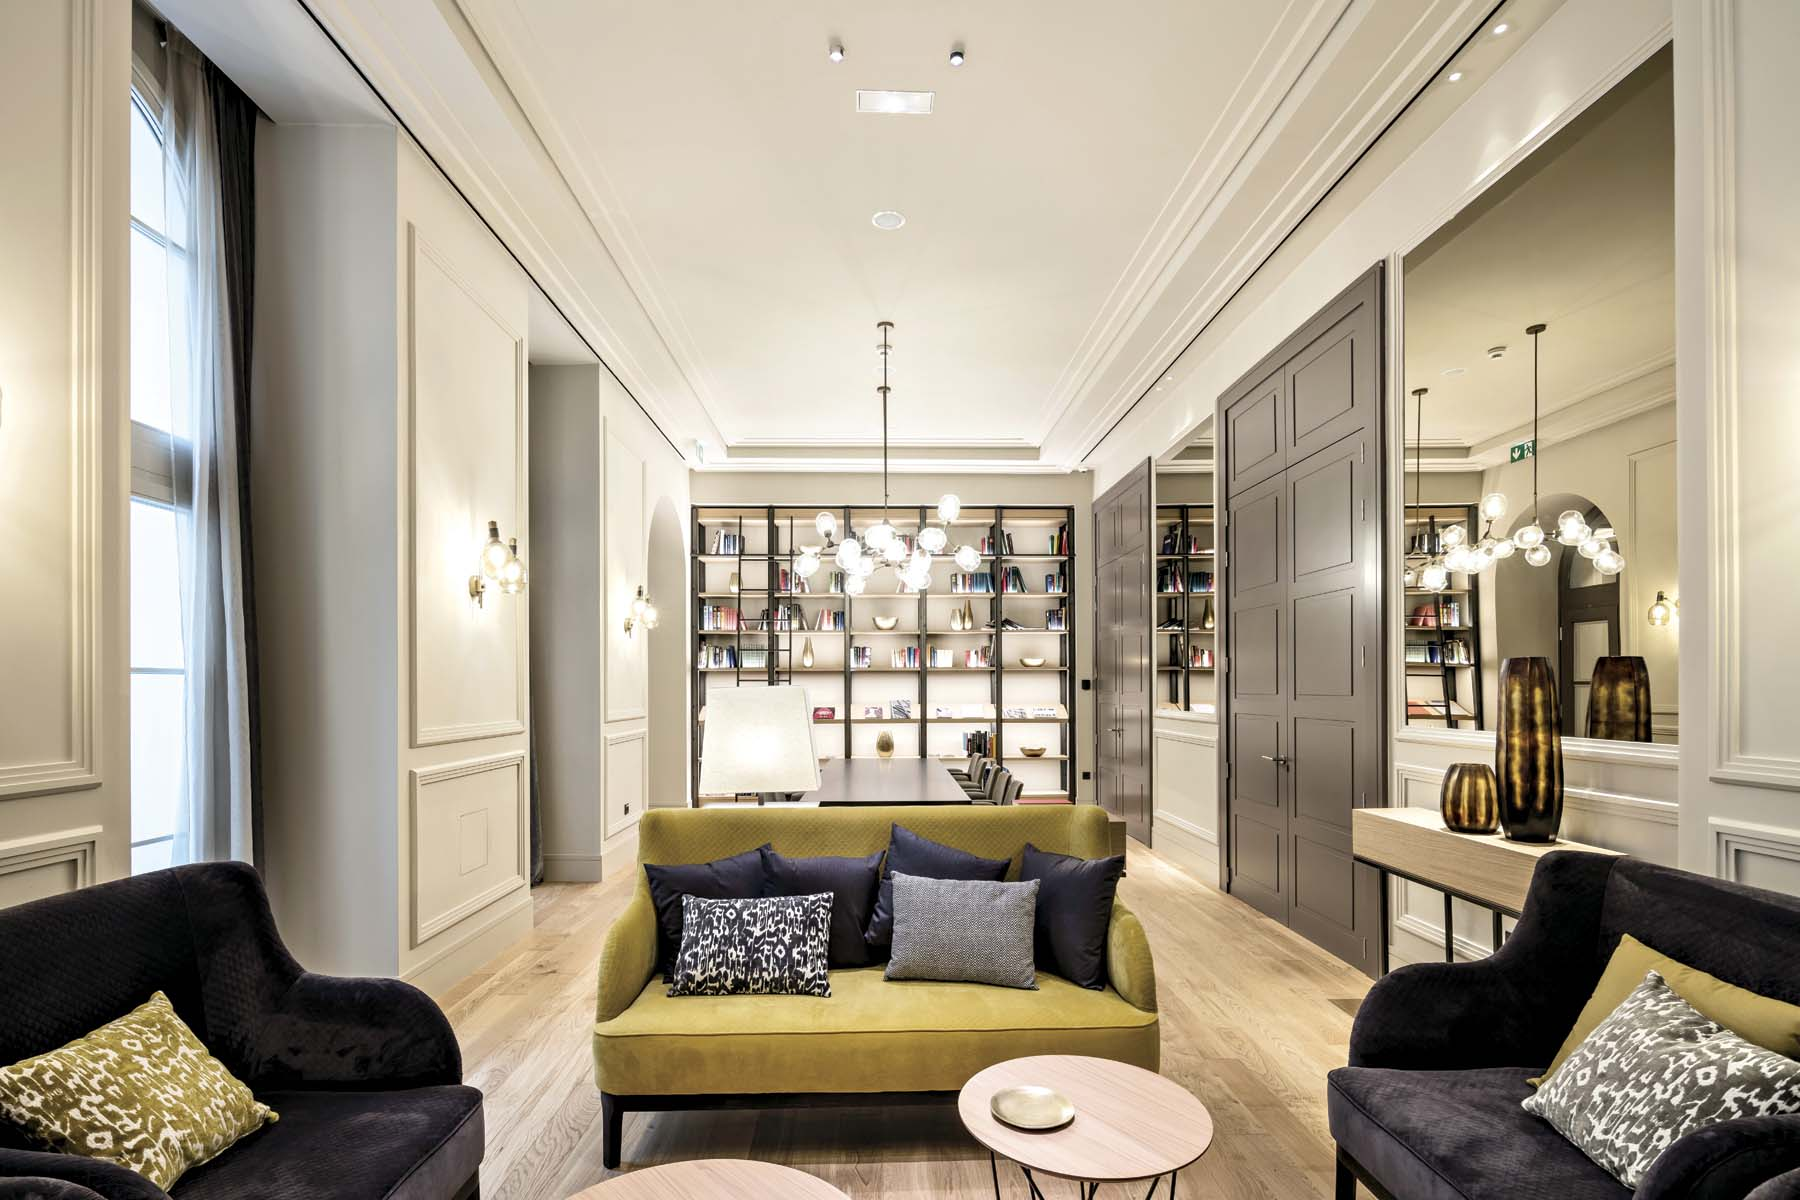 BoHo Hotel: minimalismo relajante